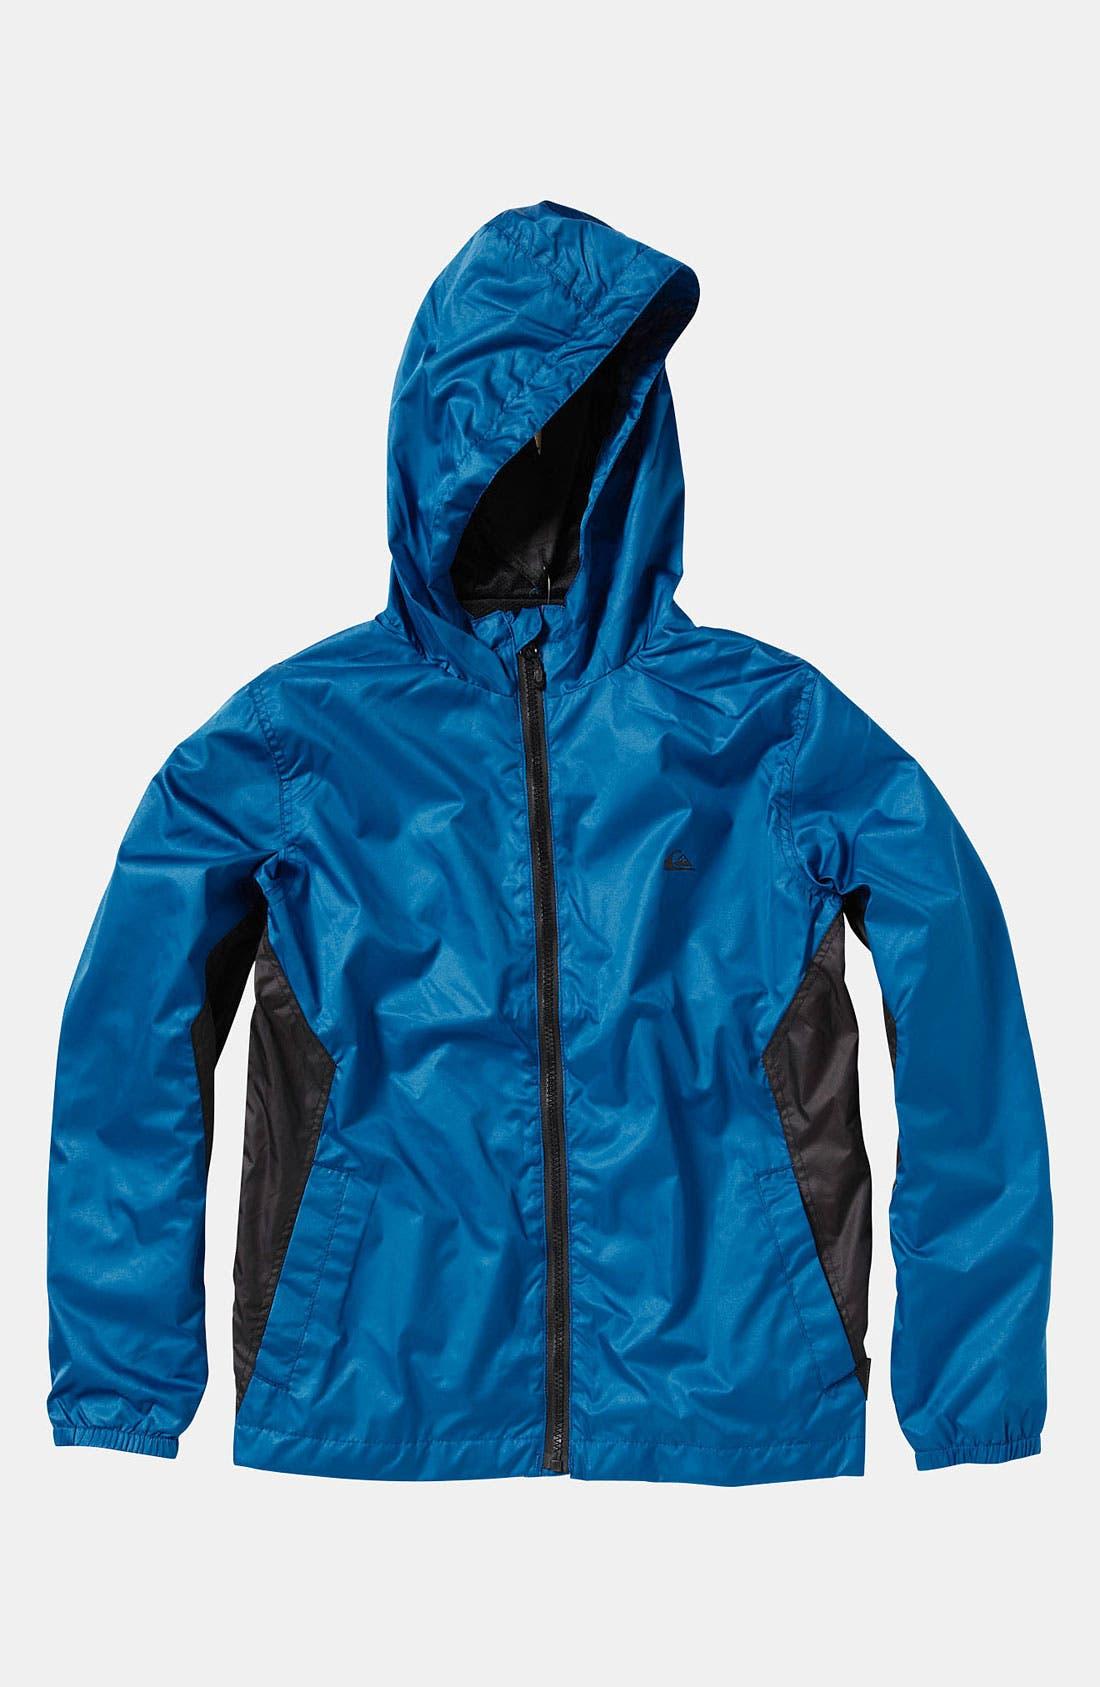 Alternate Image 1 Selected - Quiksilver 'Buddy' Windbreaker Jacket (Infant)